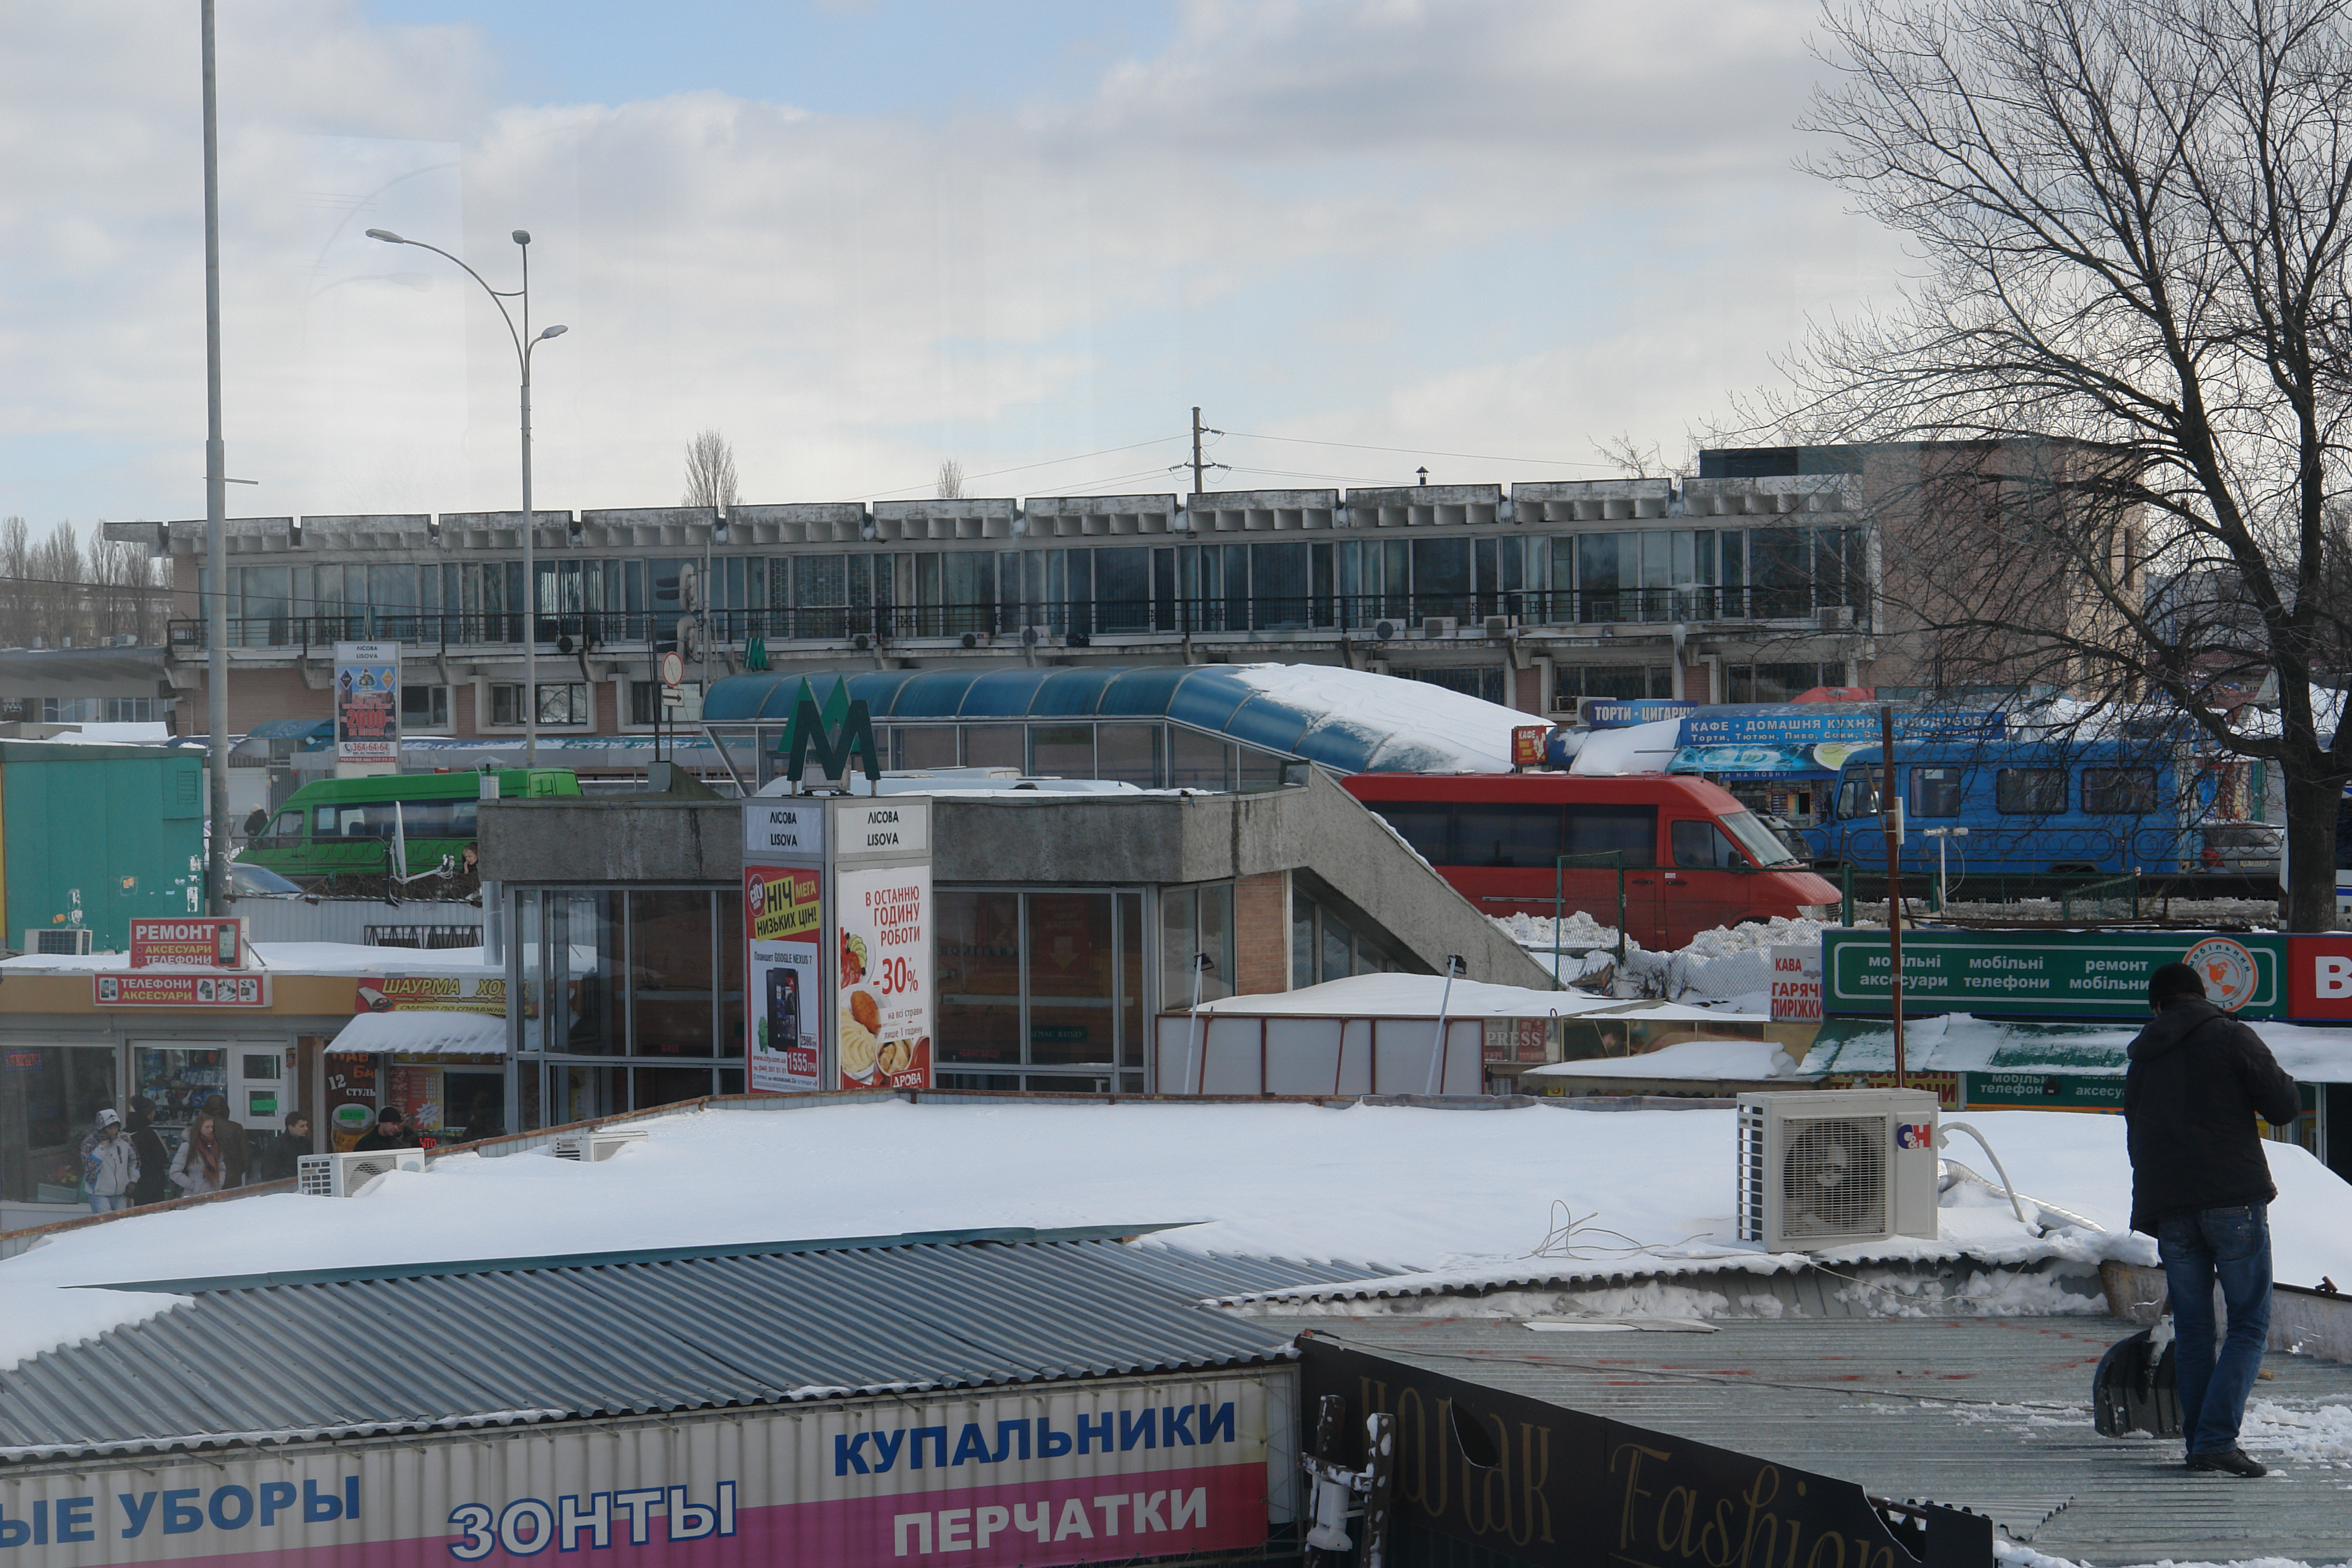 метро в киеве до: